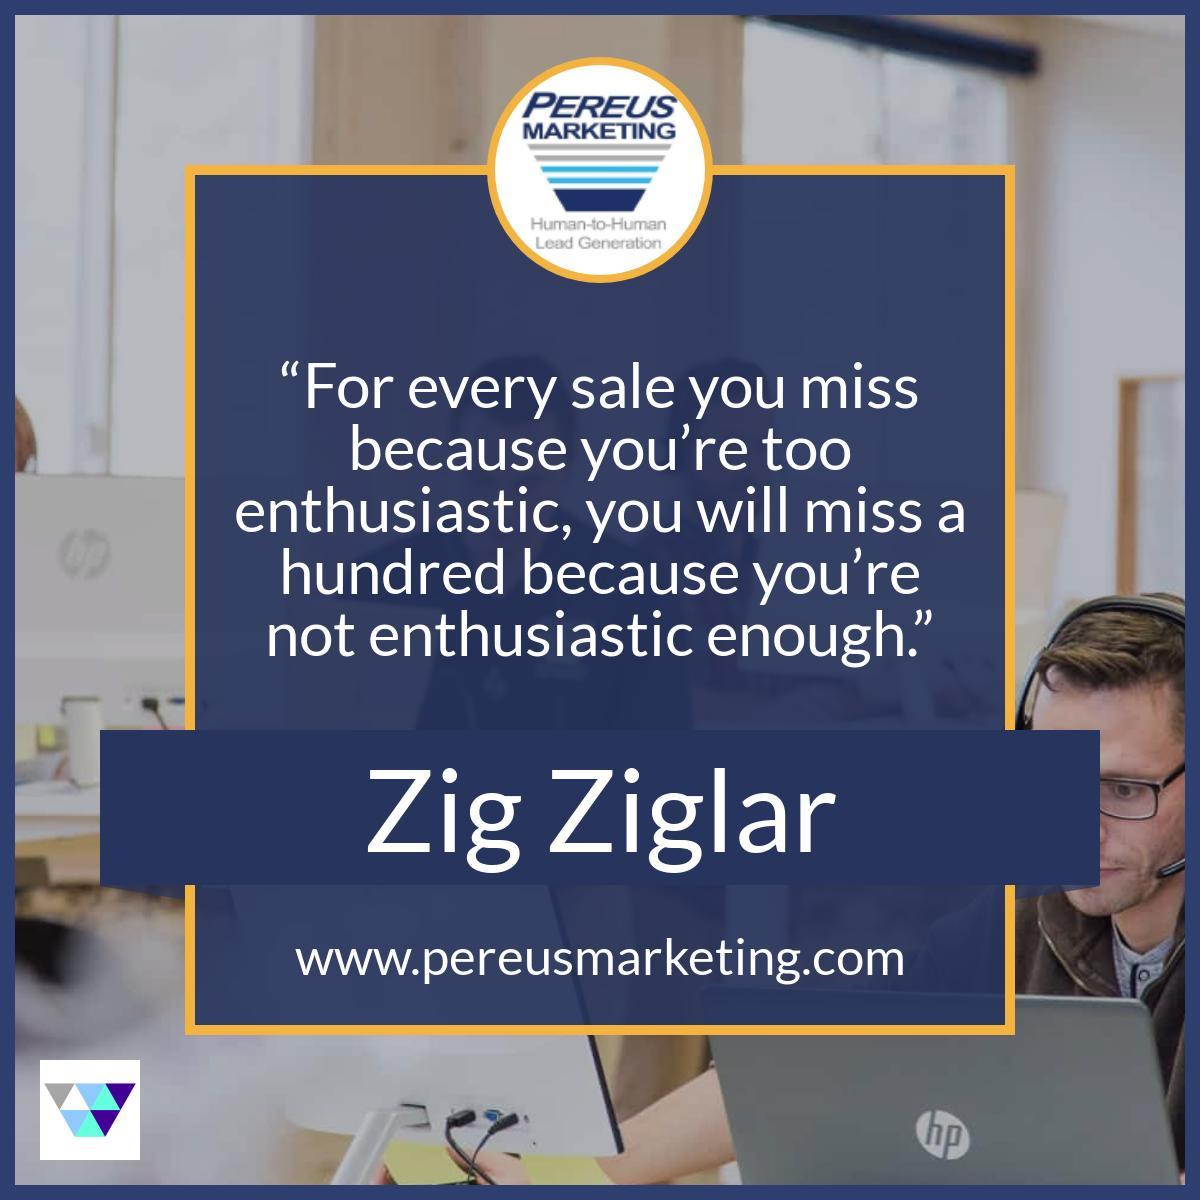 Pereus Marketing (@pereusmarketing) | Twitter